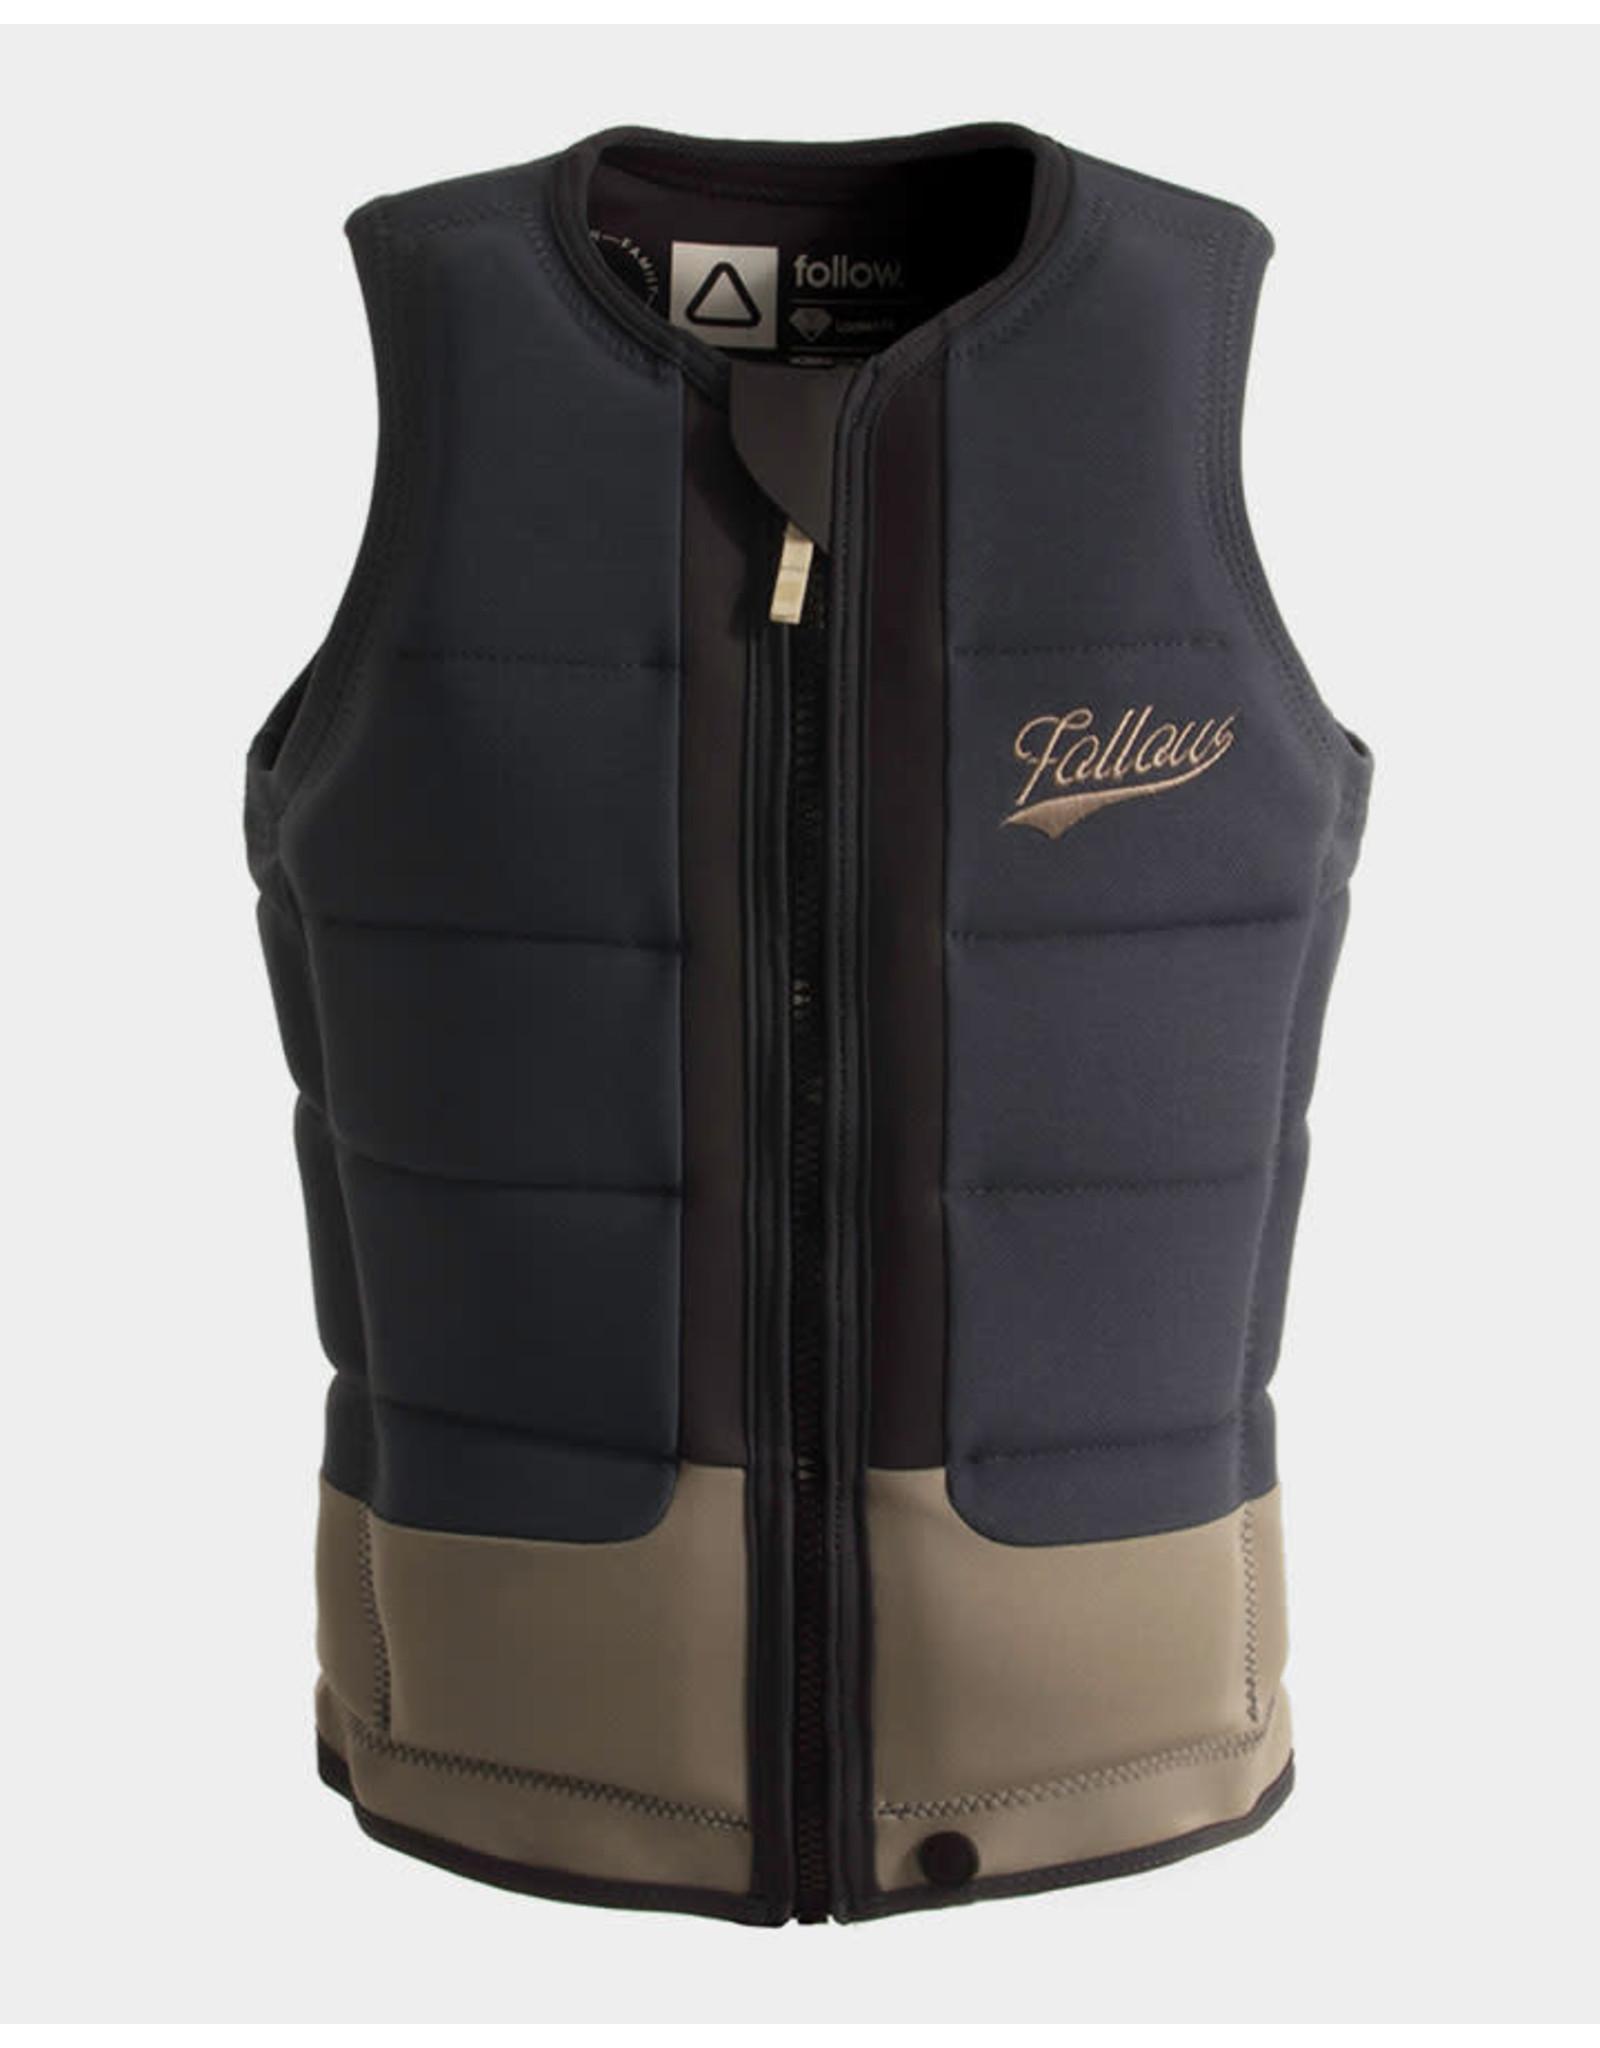 Follow Stow Ladies Competition Vest